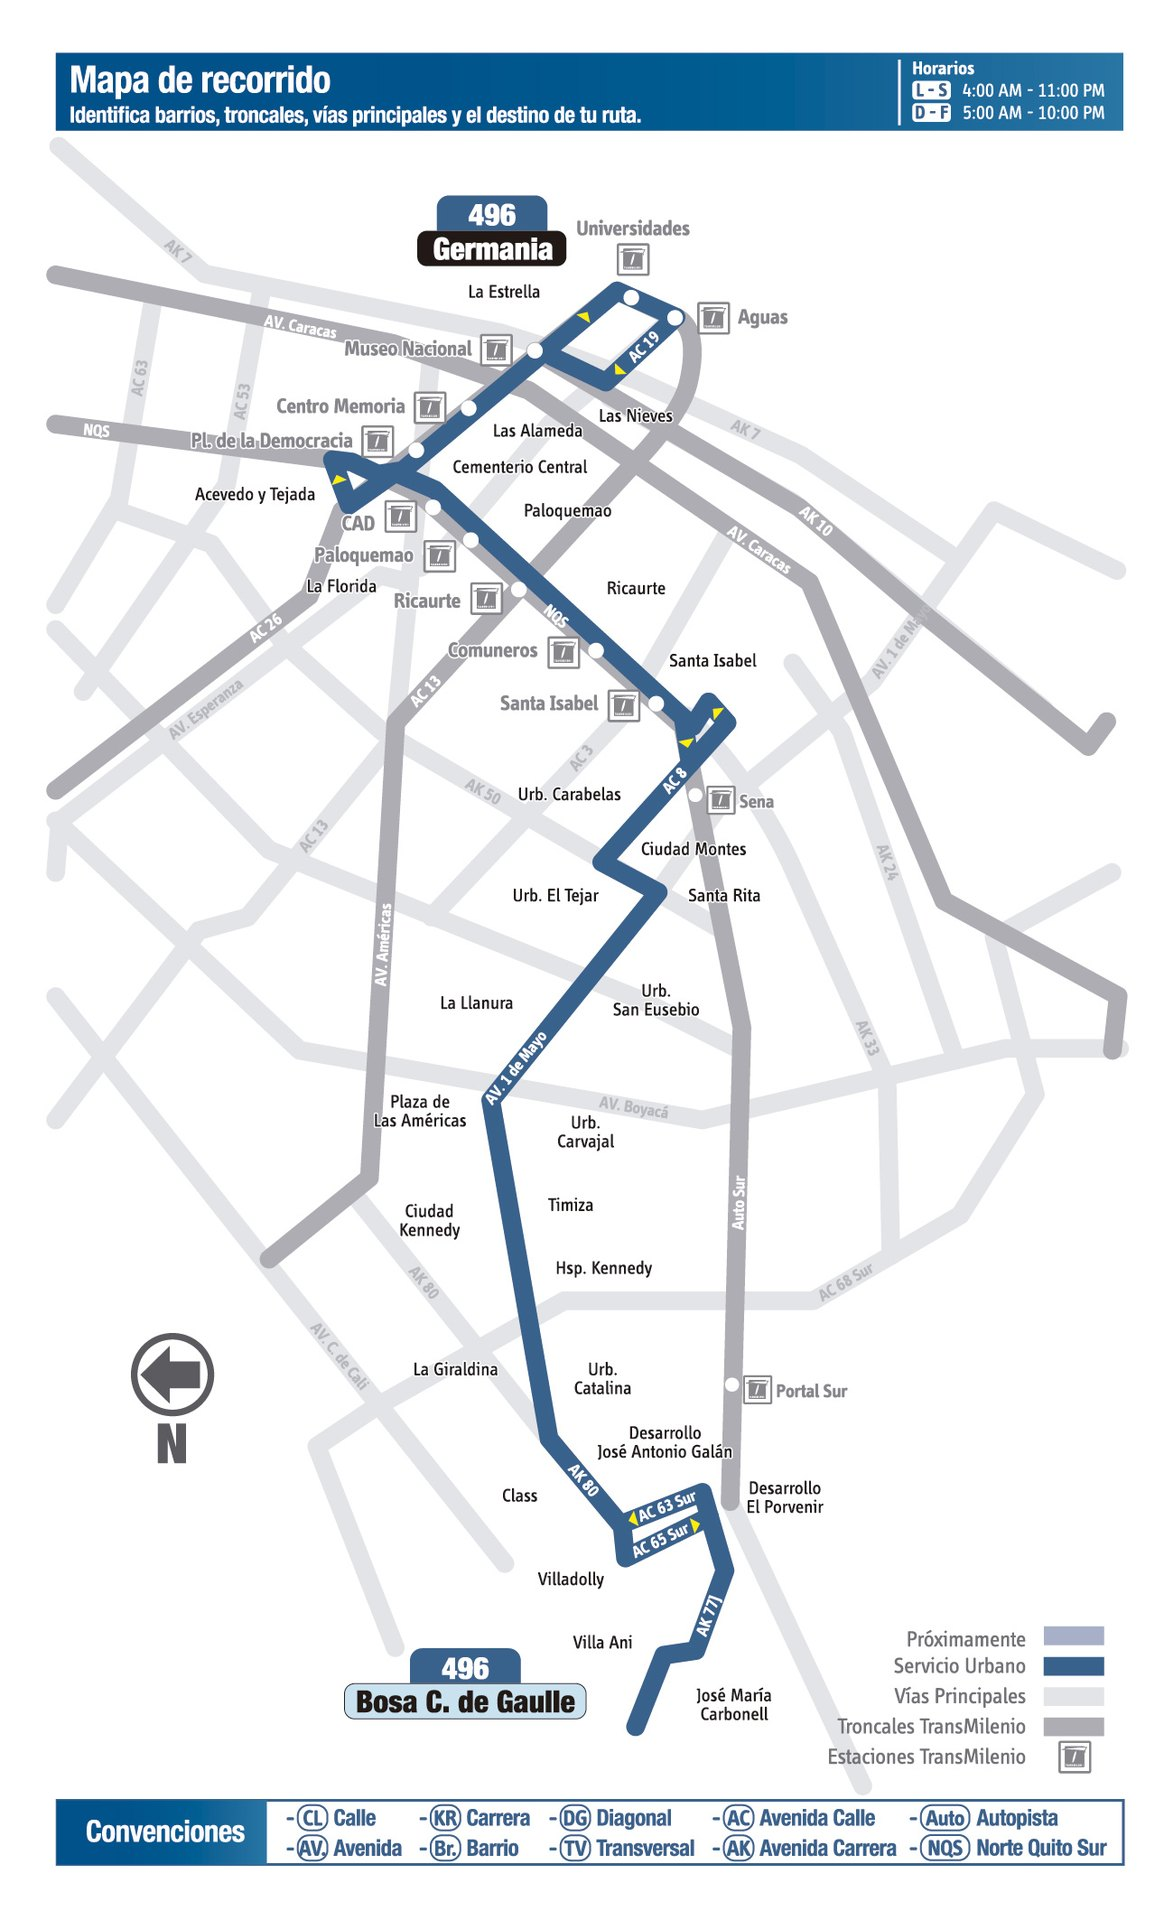 Ruta SITP: 496 Charles de Gaulle ↔ Germania [Urbana] 1